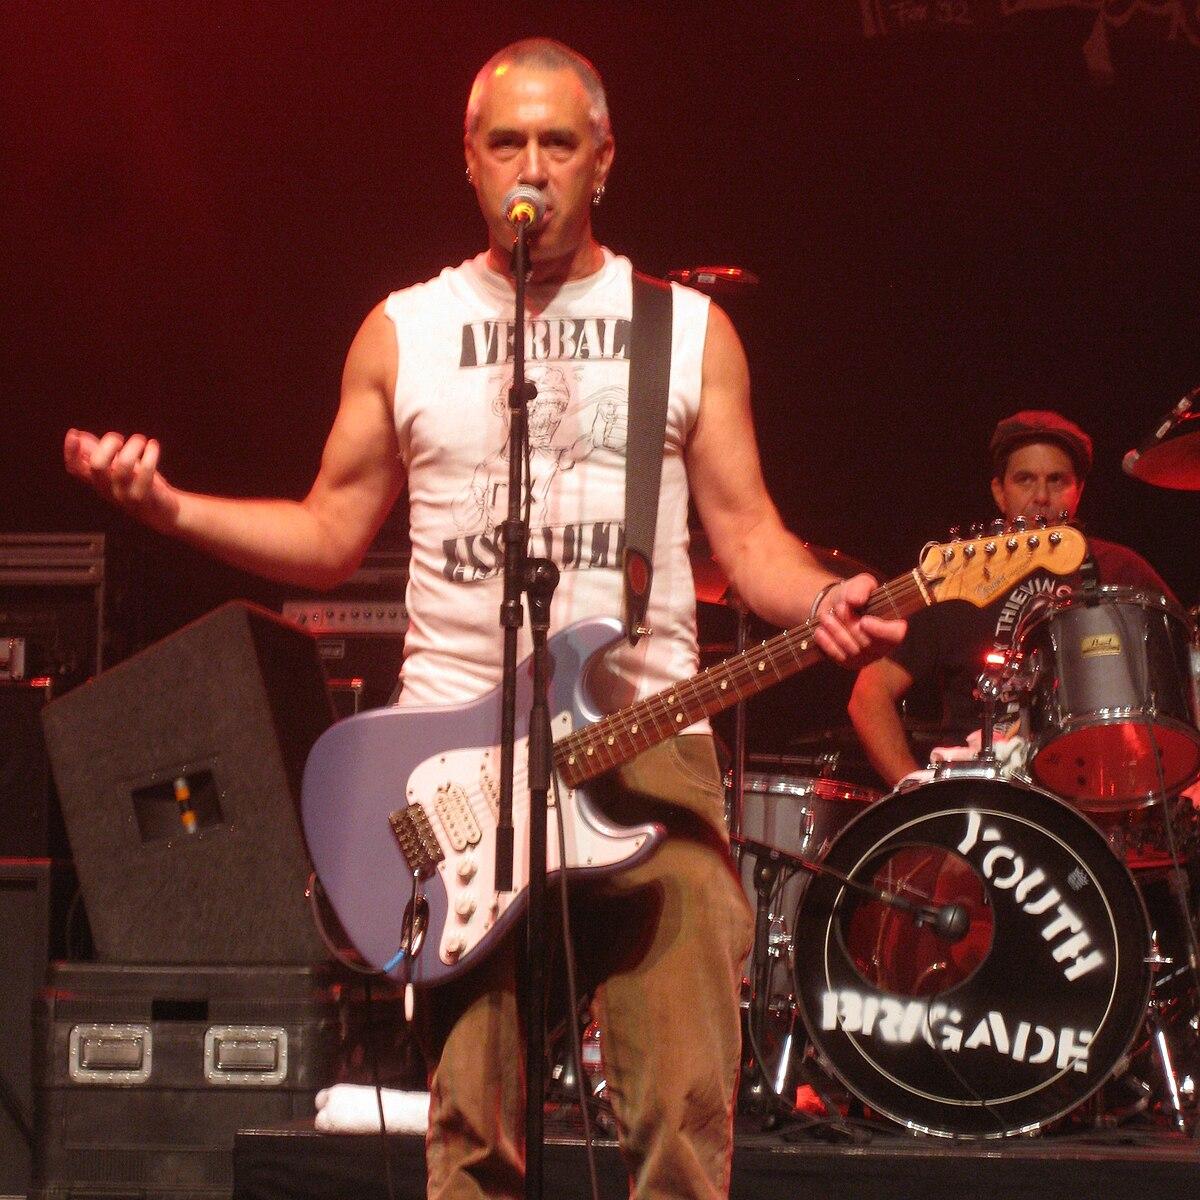 Youth Brigade (band) - Wikipedia